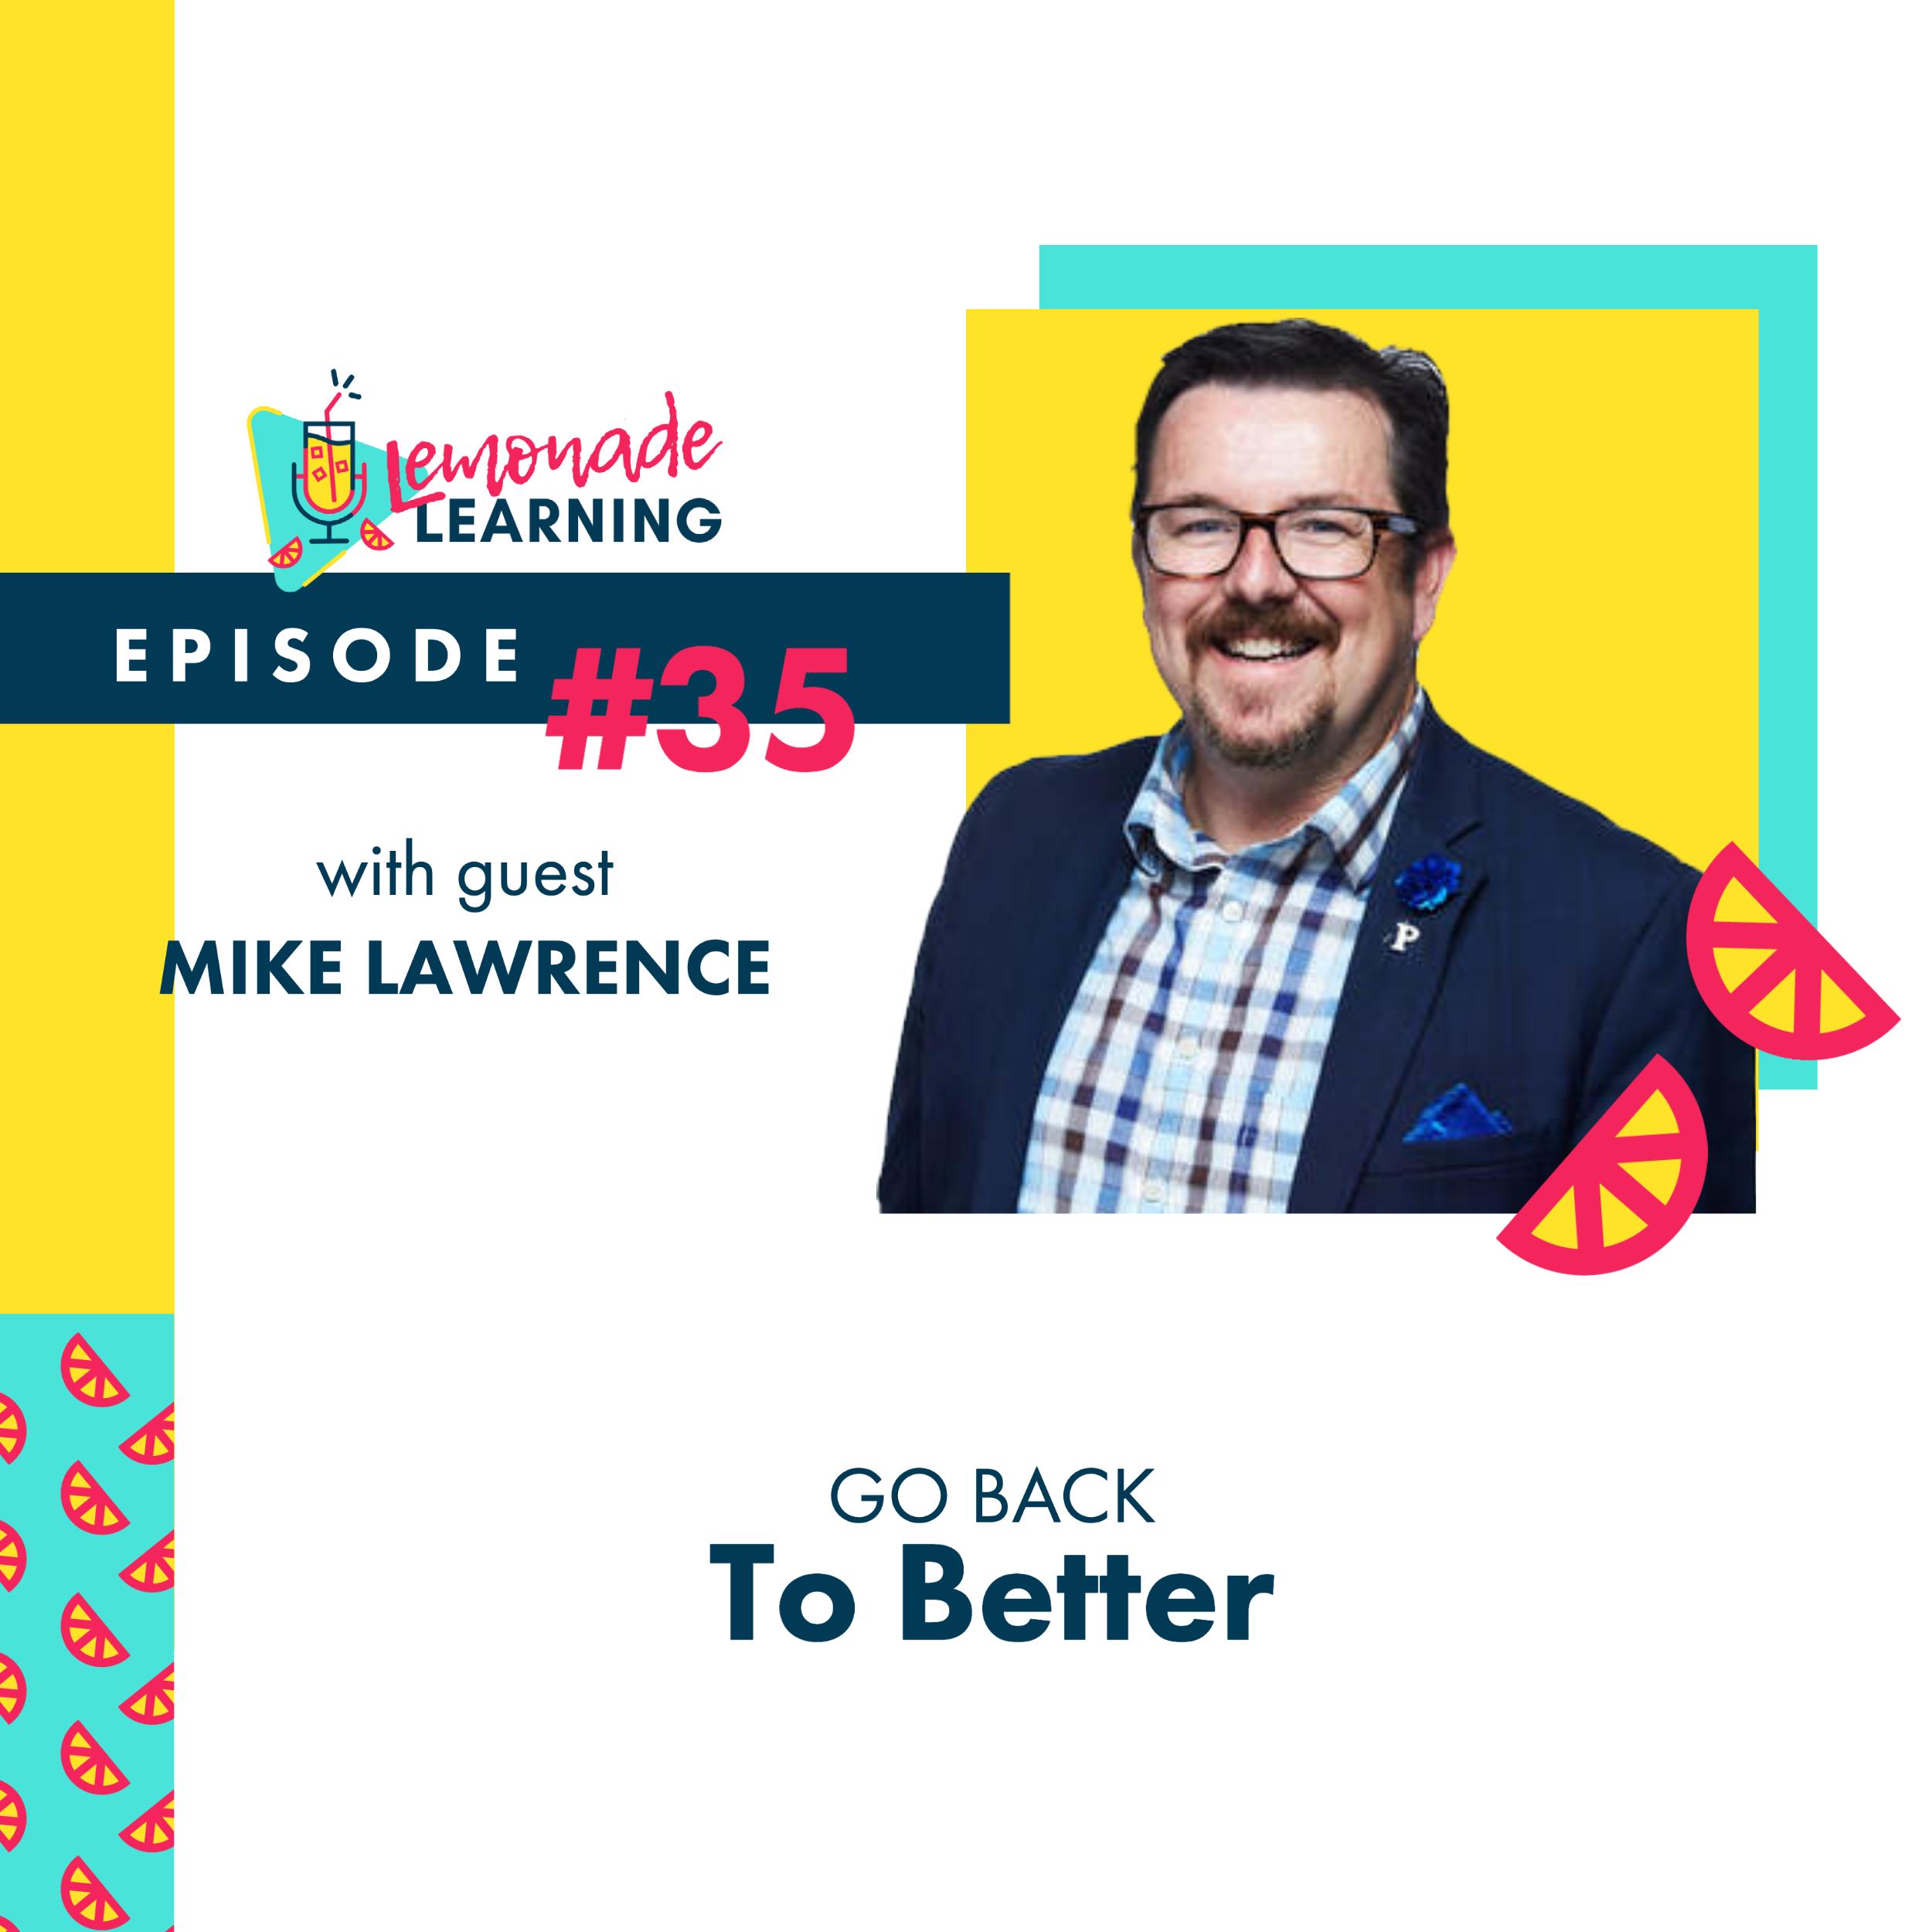 Mike Lawrence joins Lemonade Learning for episode 35, Go Back To Better